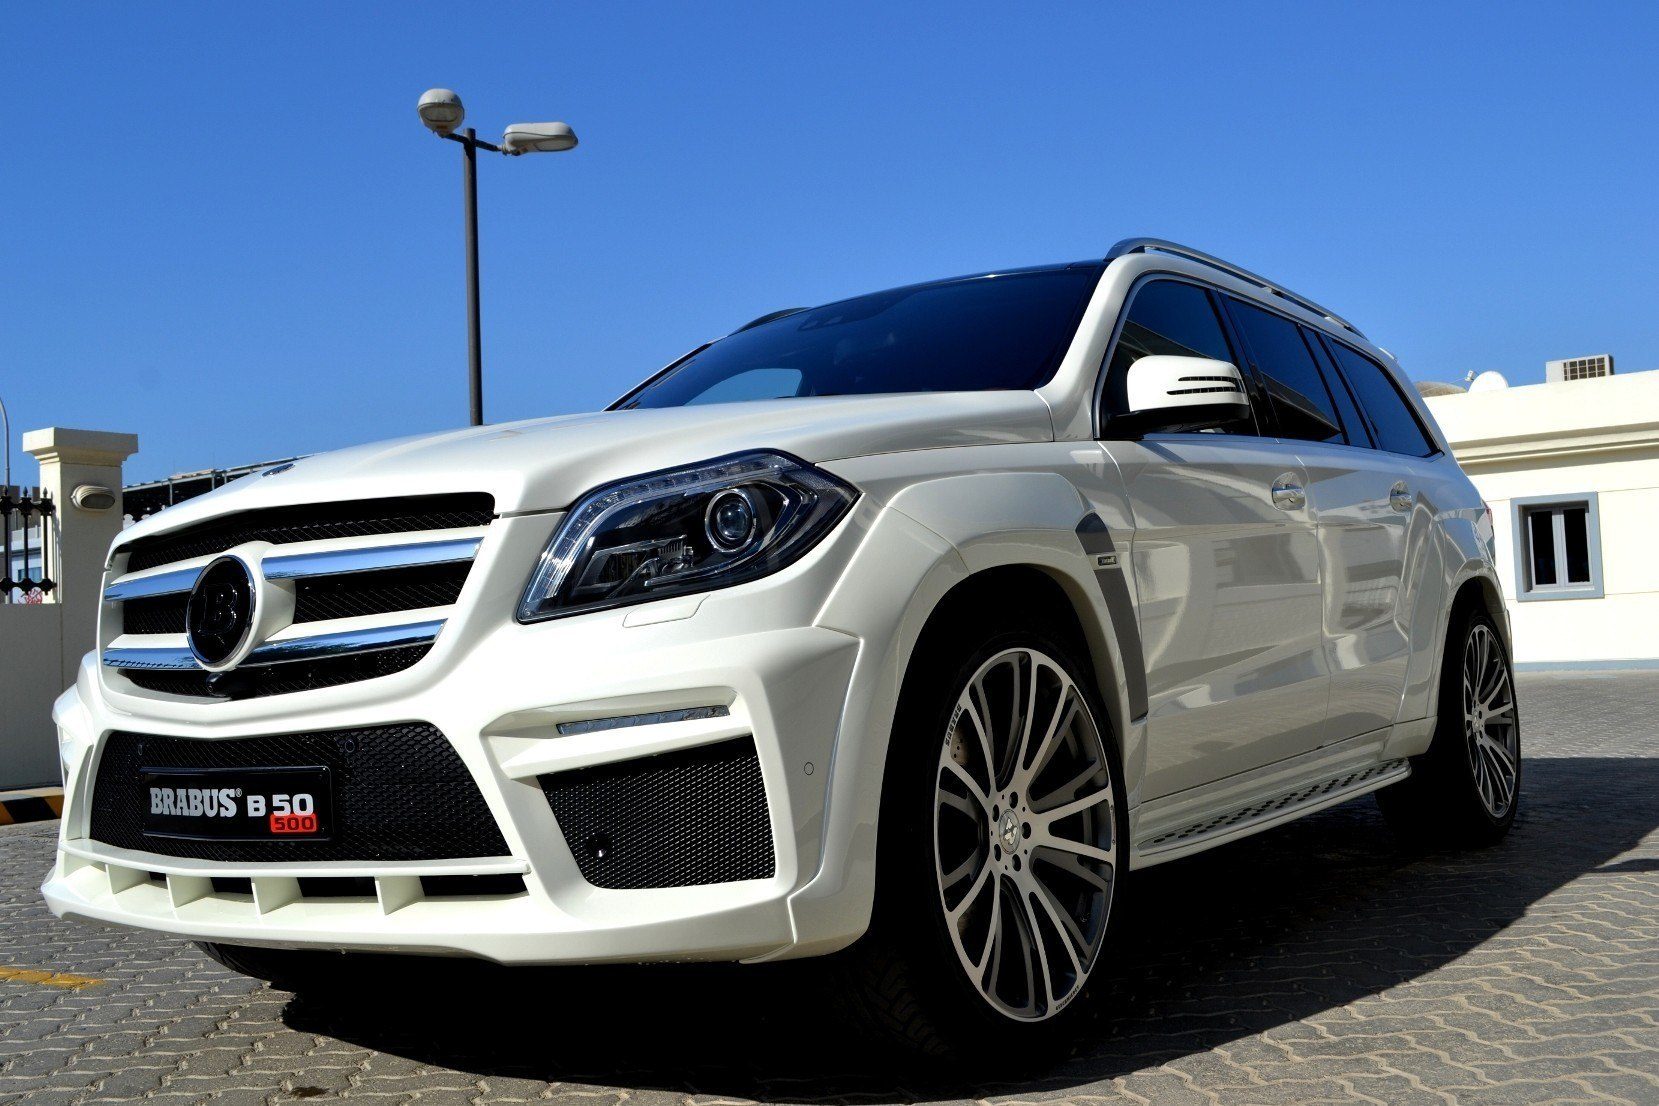 186mph 7 Seat Suv Brabus B63s 700 Widestar For Mercedes